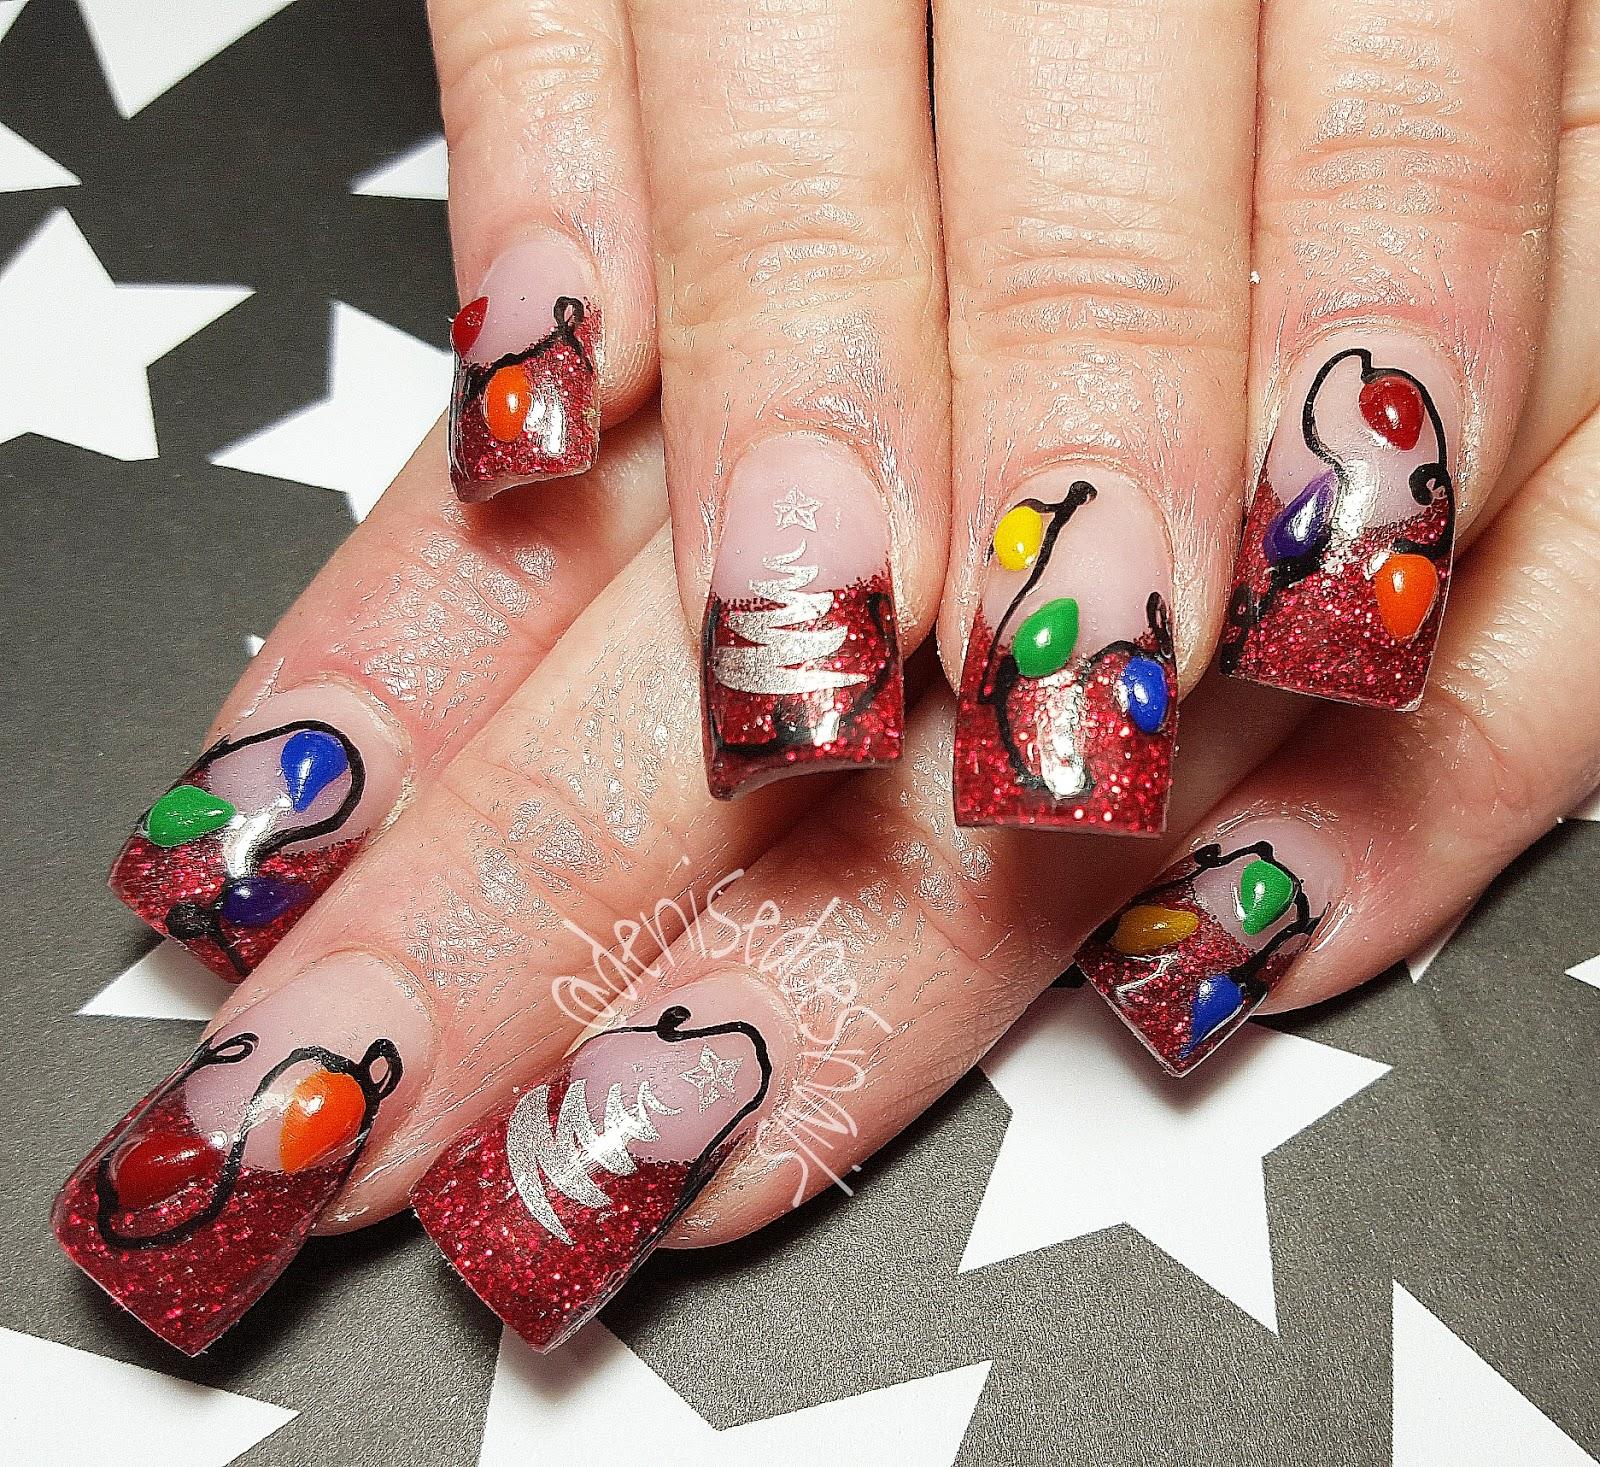 Christmas Light Nails: Nail Art By Denise Groves: Gettin' In The Christmas Spirit